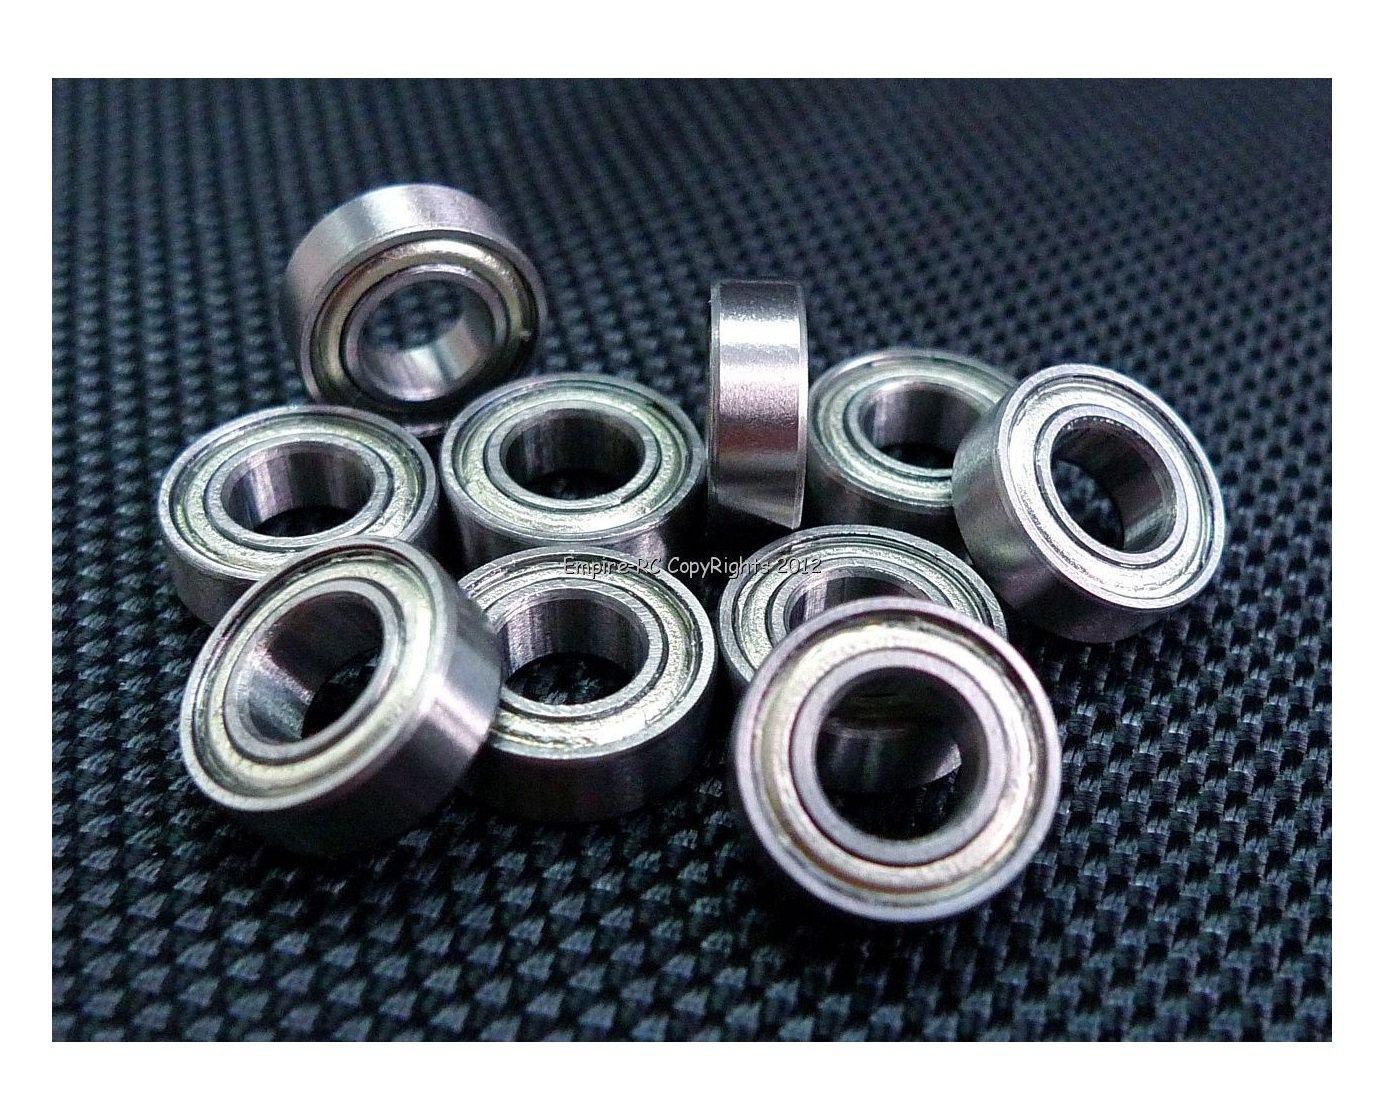 (10 PCS) MR126ZZ (6x12x4 mm) Metal Shielded Ball Bearing Bearings MR126z peel empire.rc